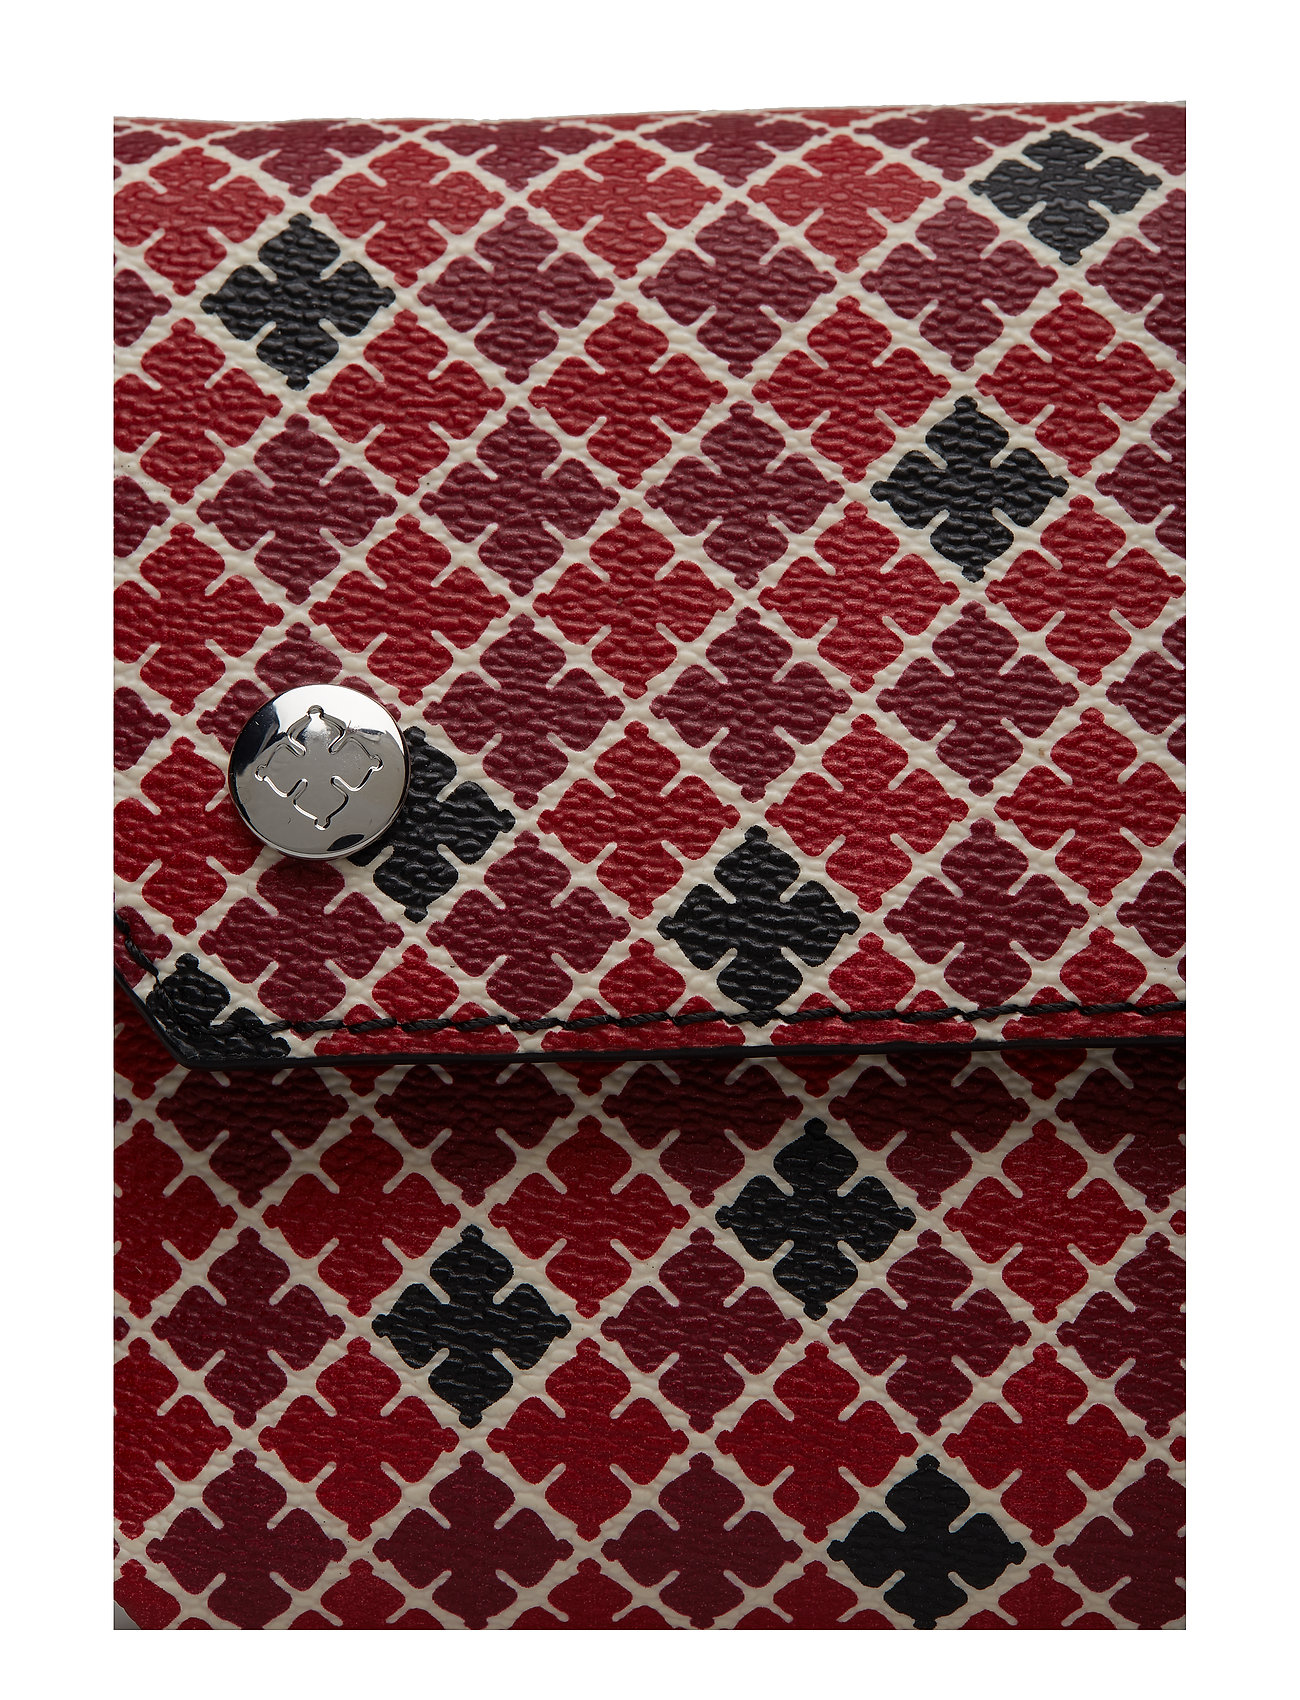 Minibright RedBy Leah Minibright Malene RedBy Leah Birger tsdxBQhoCr